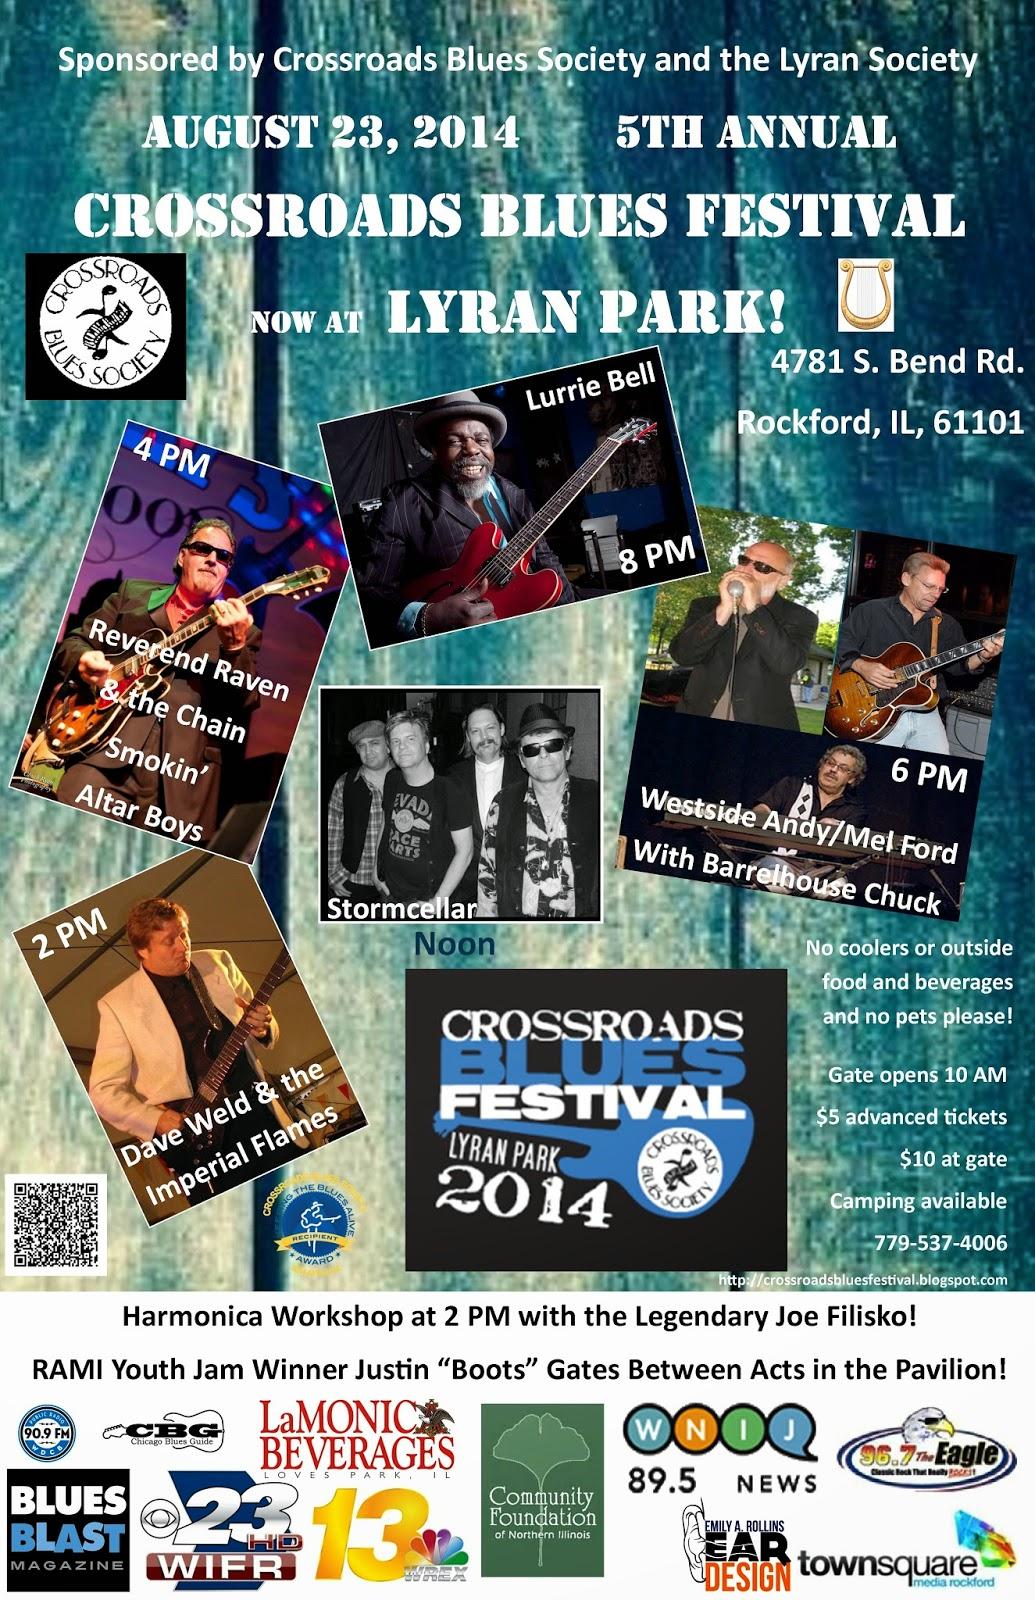 2014 Crossroads Bues Festival